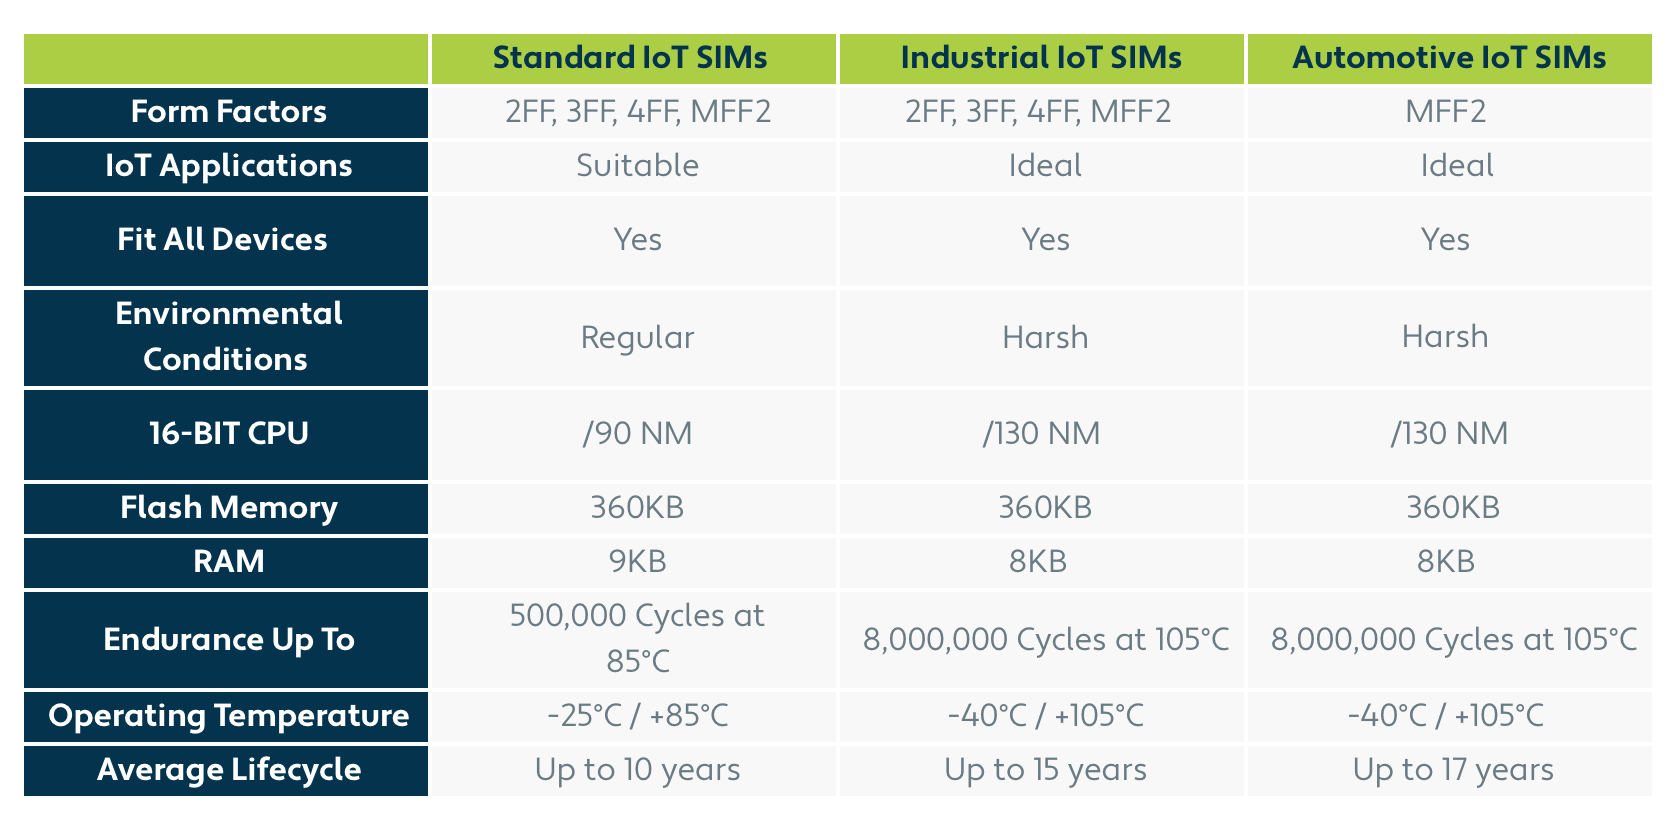 IoT SIM models and their functionalities